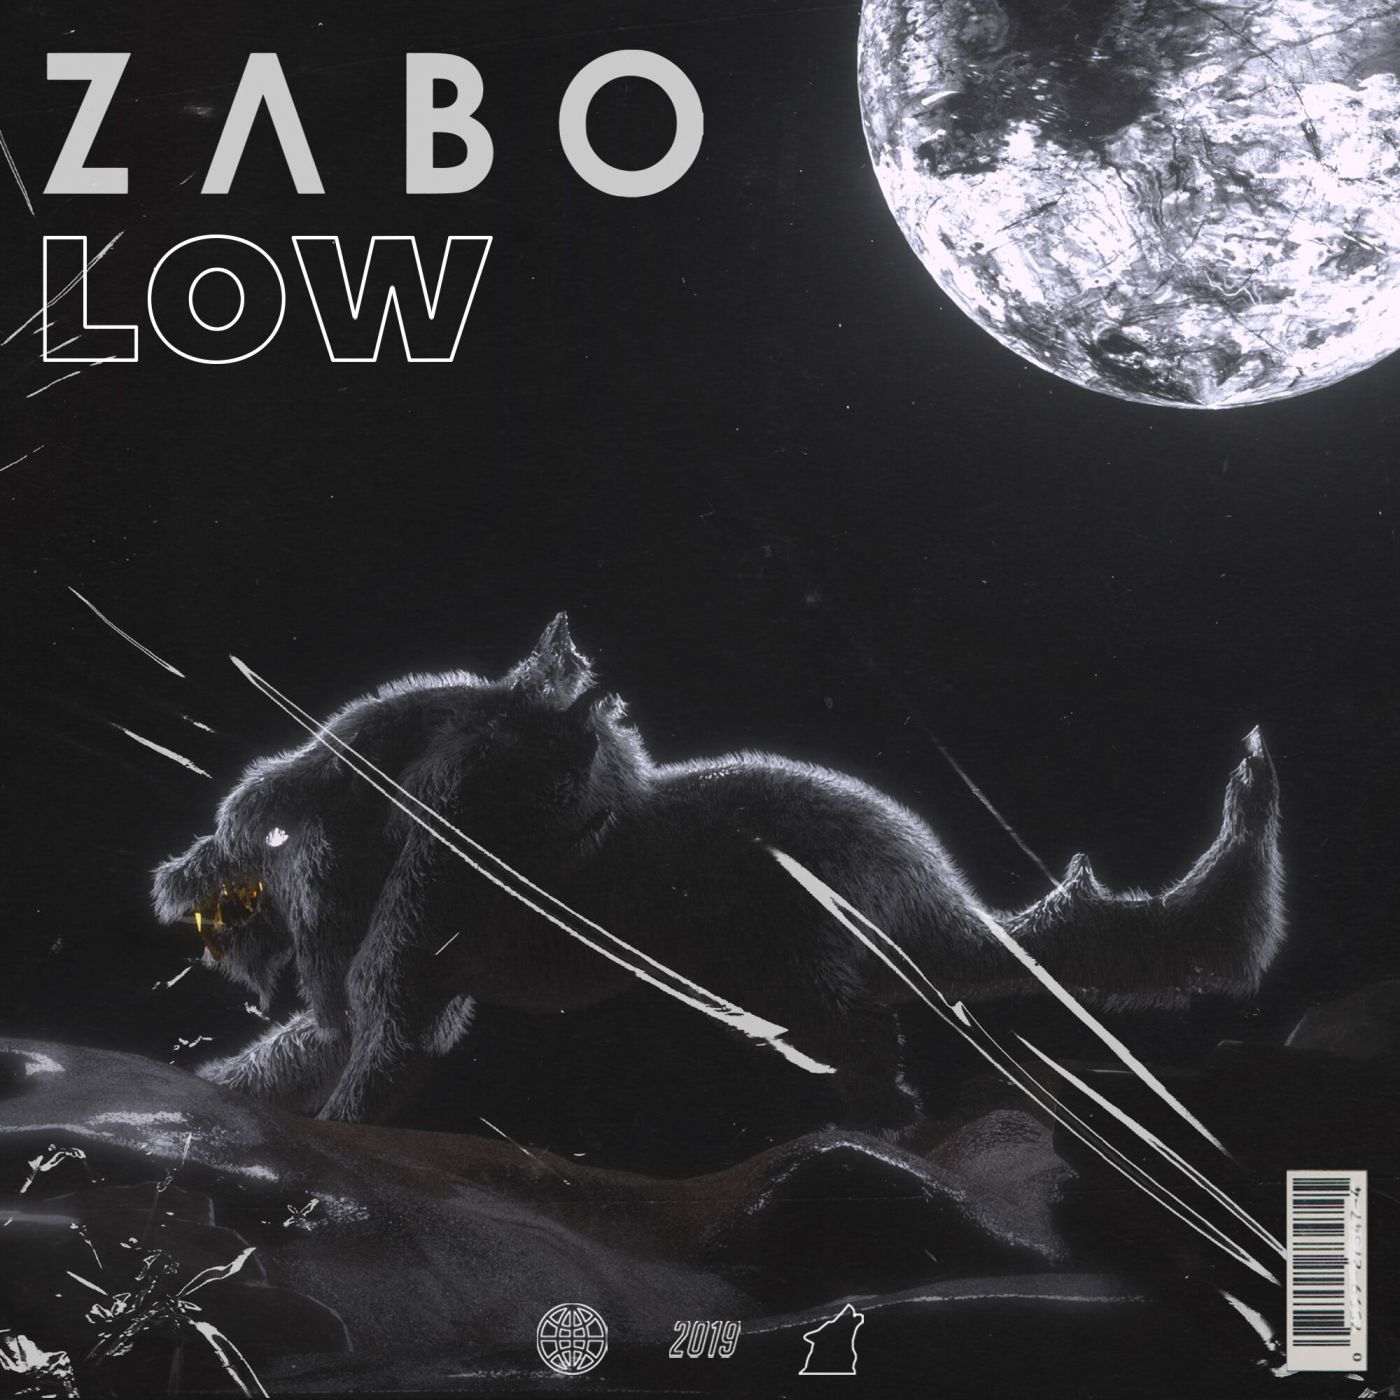 ZABO Low 2